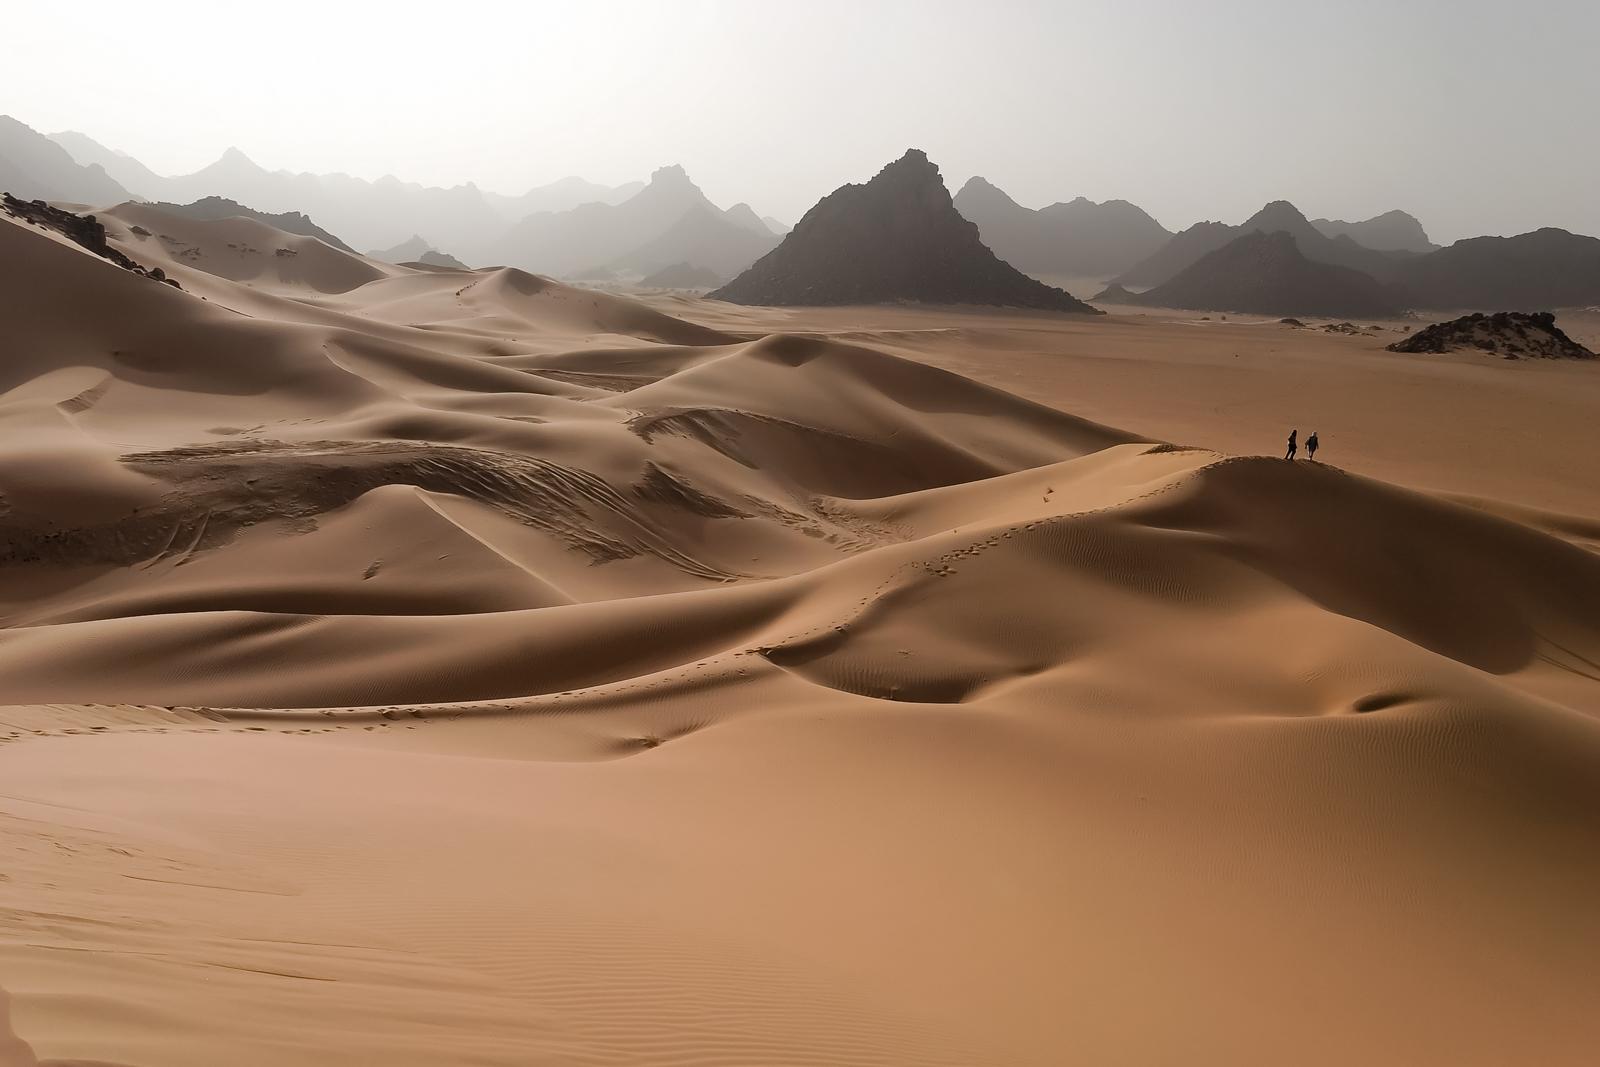 Tenere Desert - Dunes and Mountains